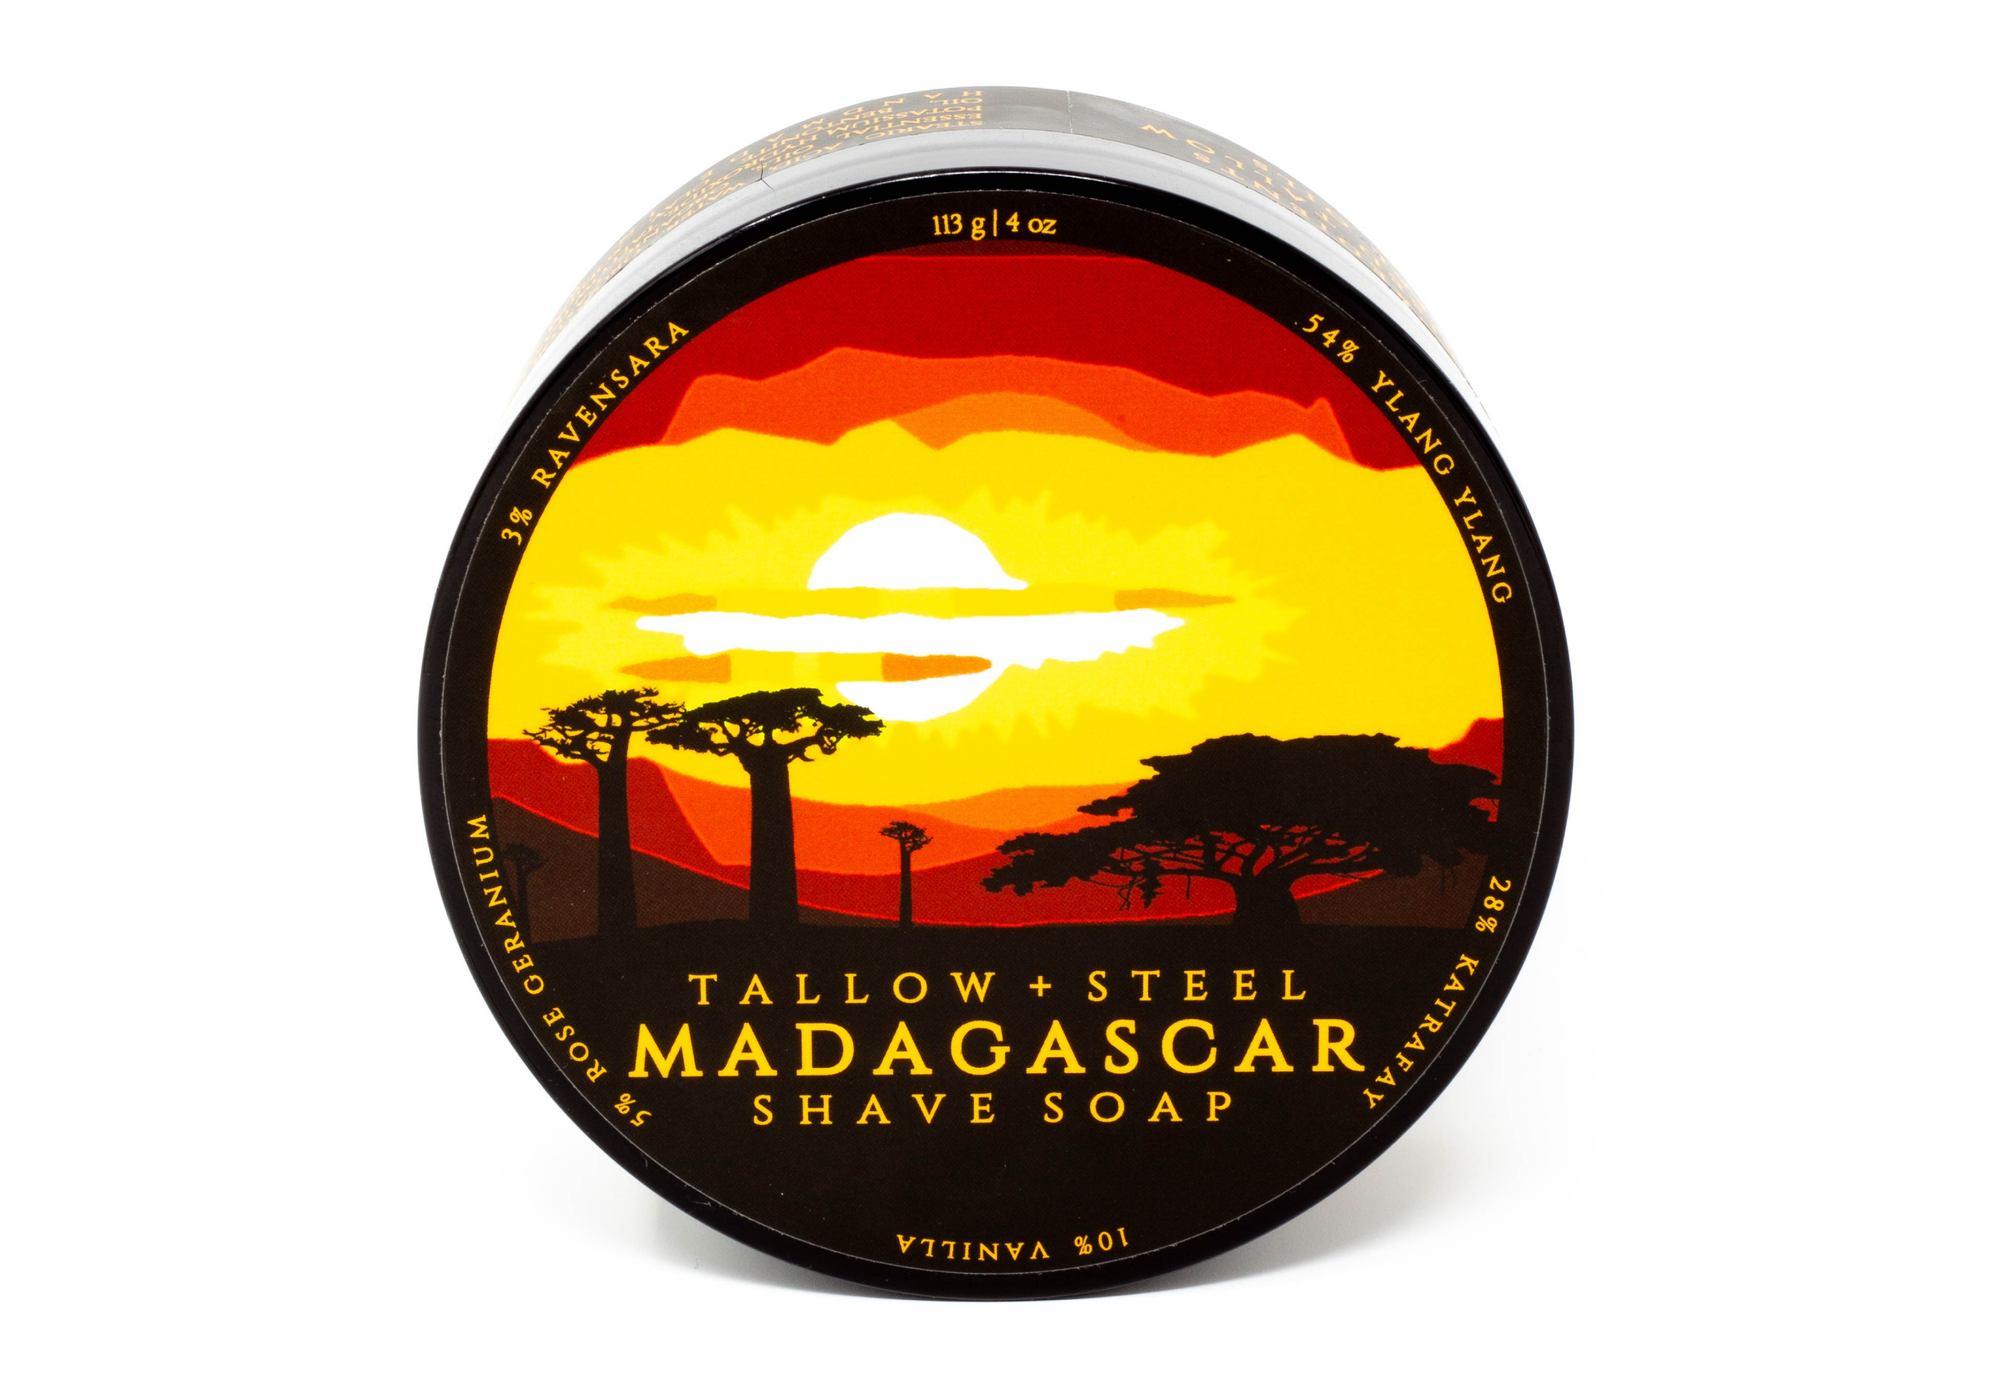 Tallow + Steel - Madagascar - Soap image